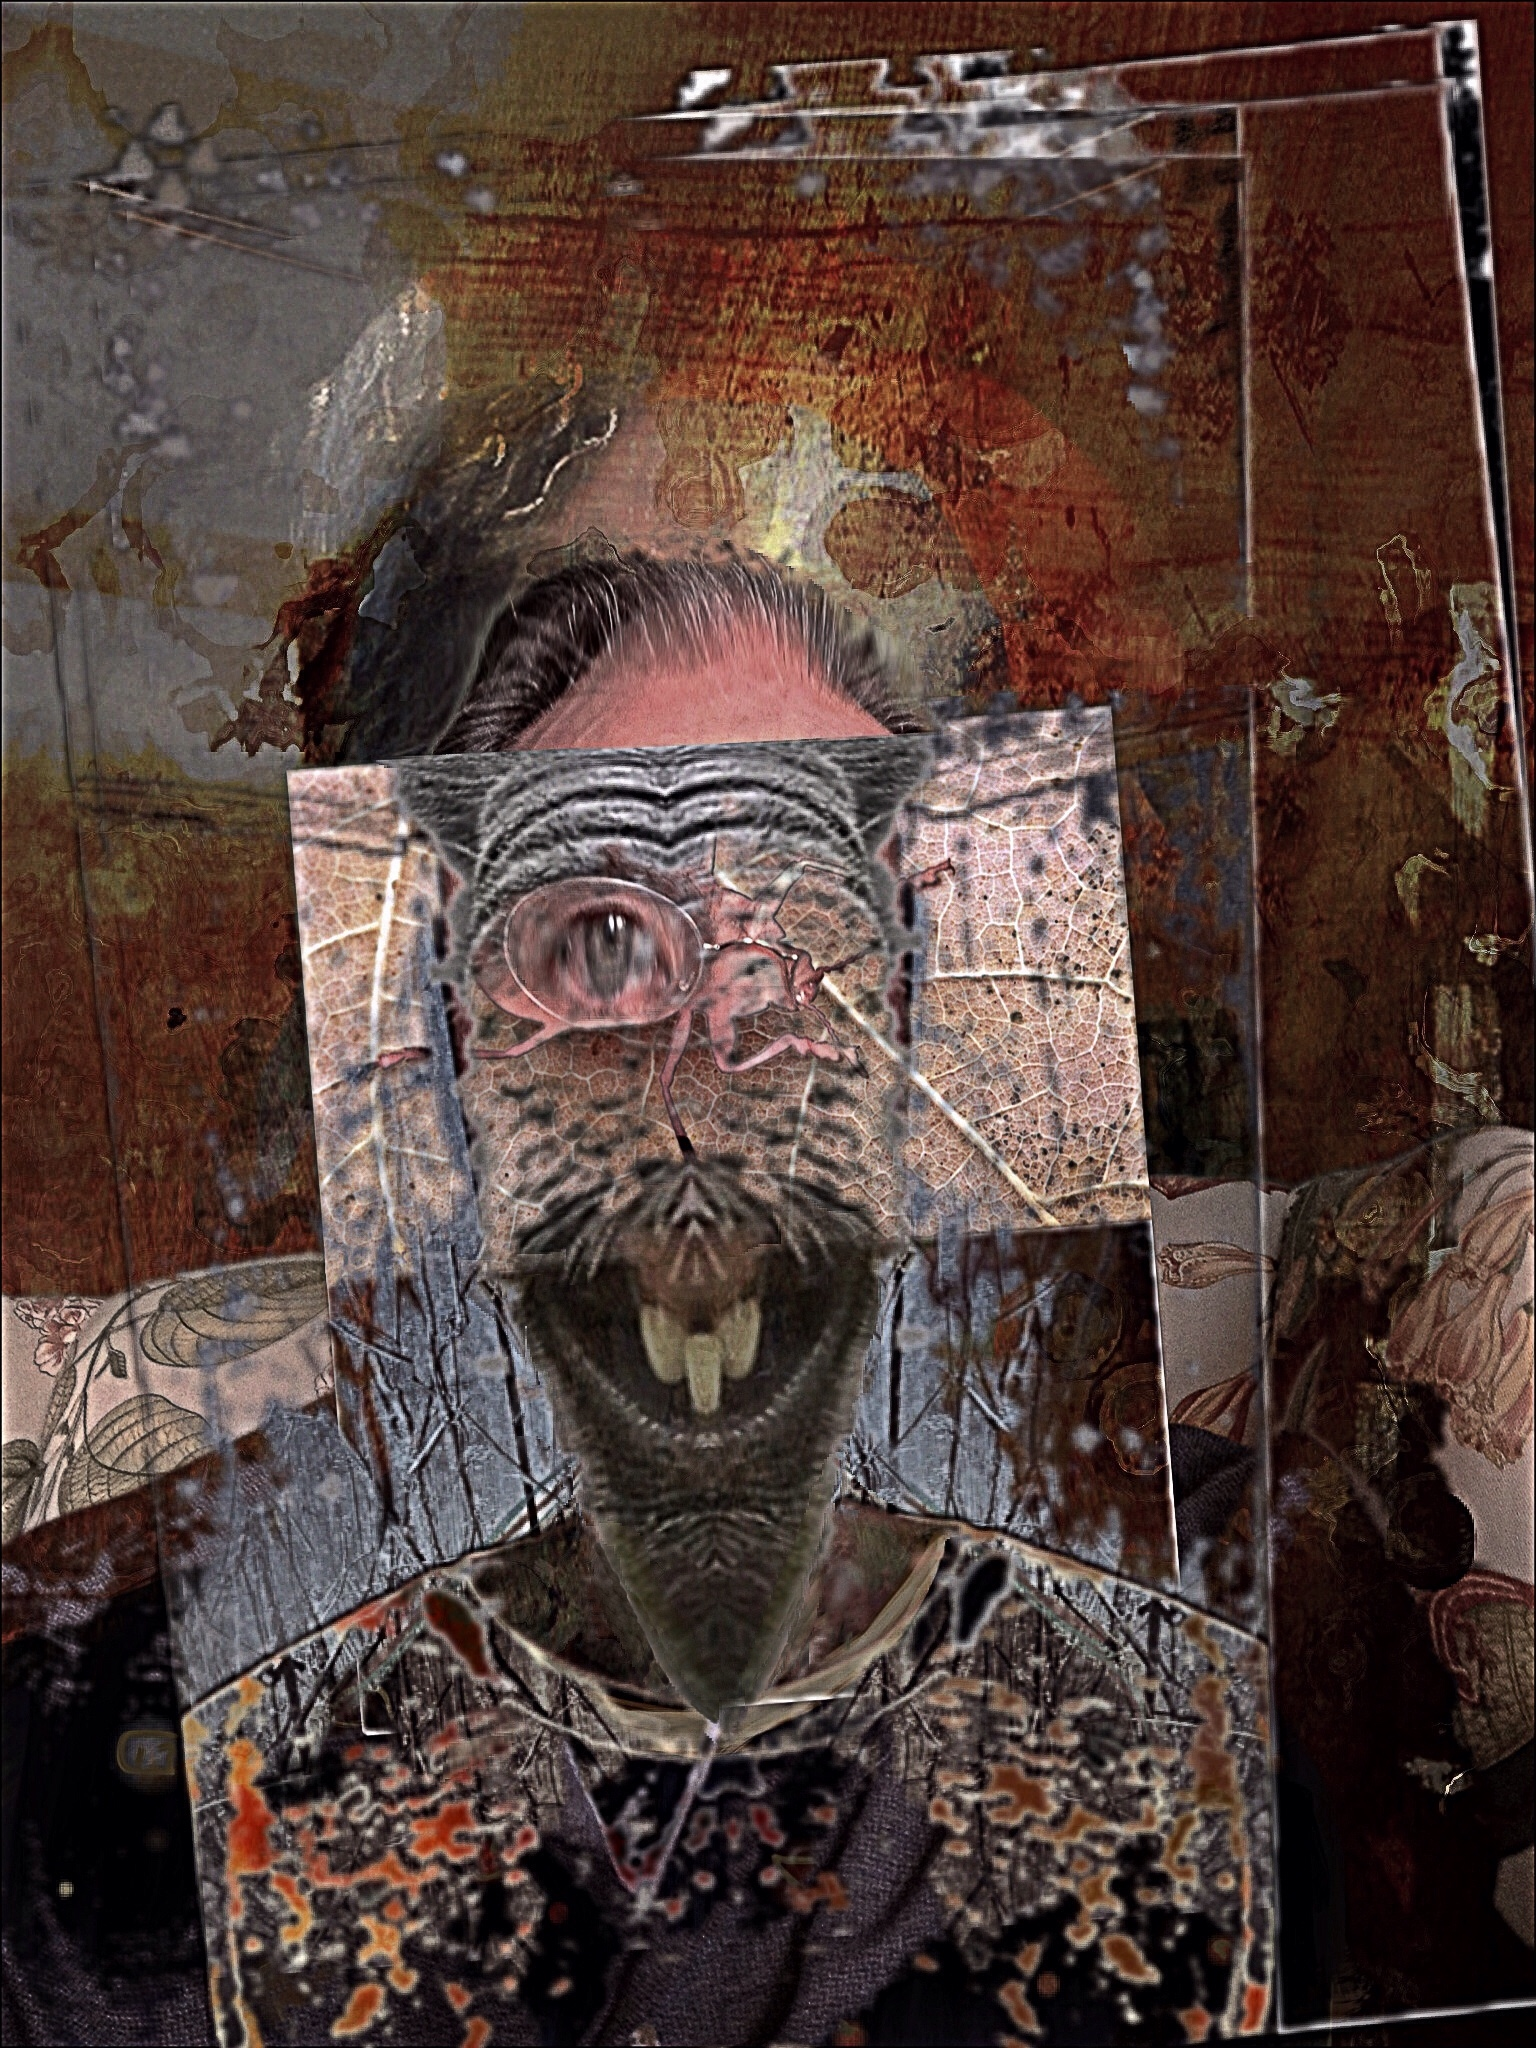 Damian De Souza ~ The Creepy Surrealist